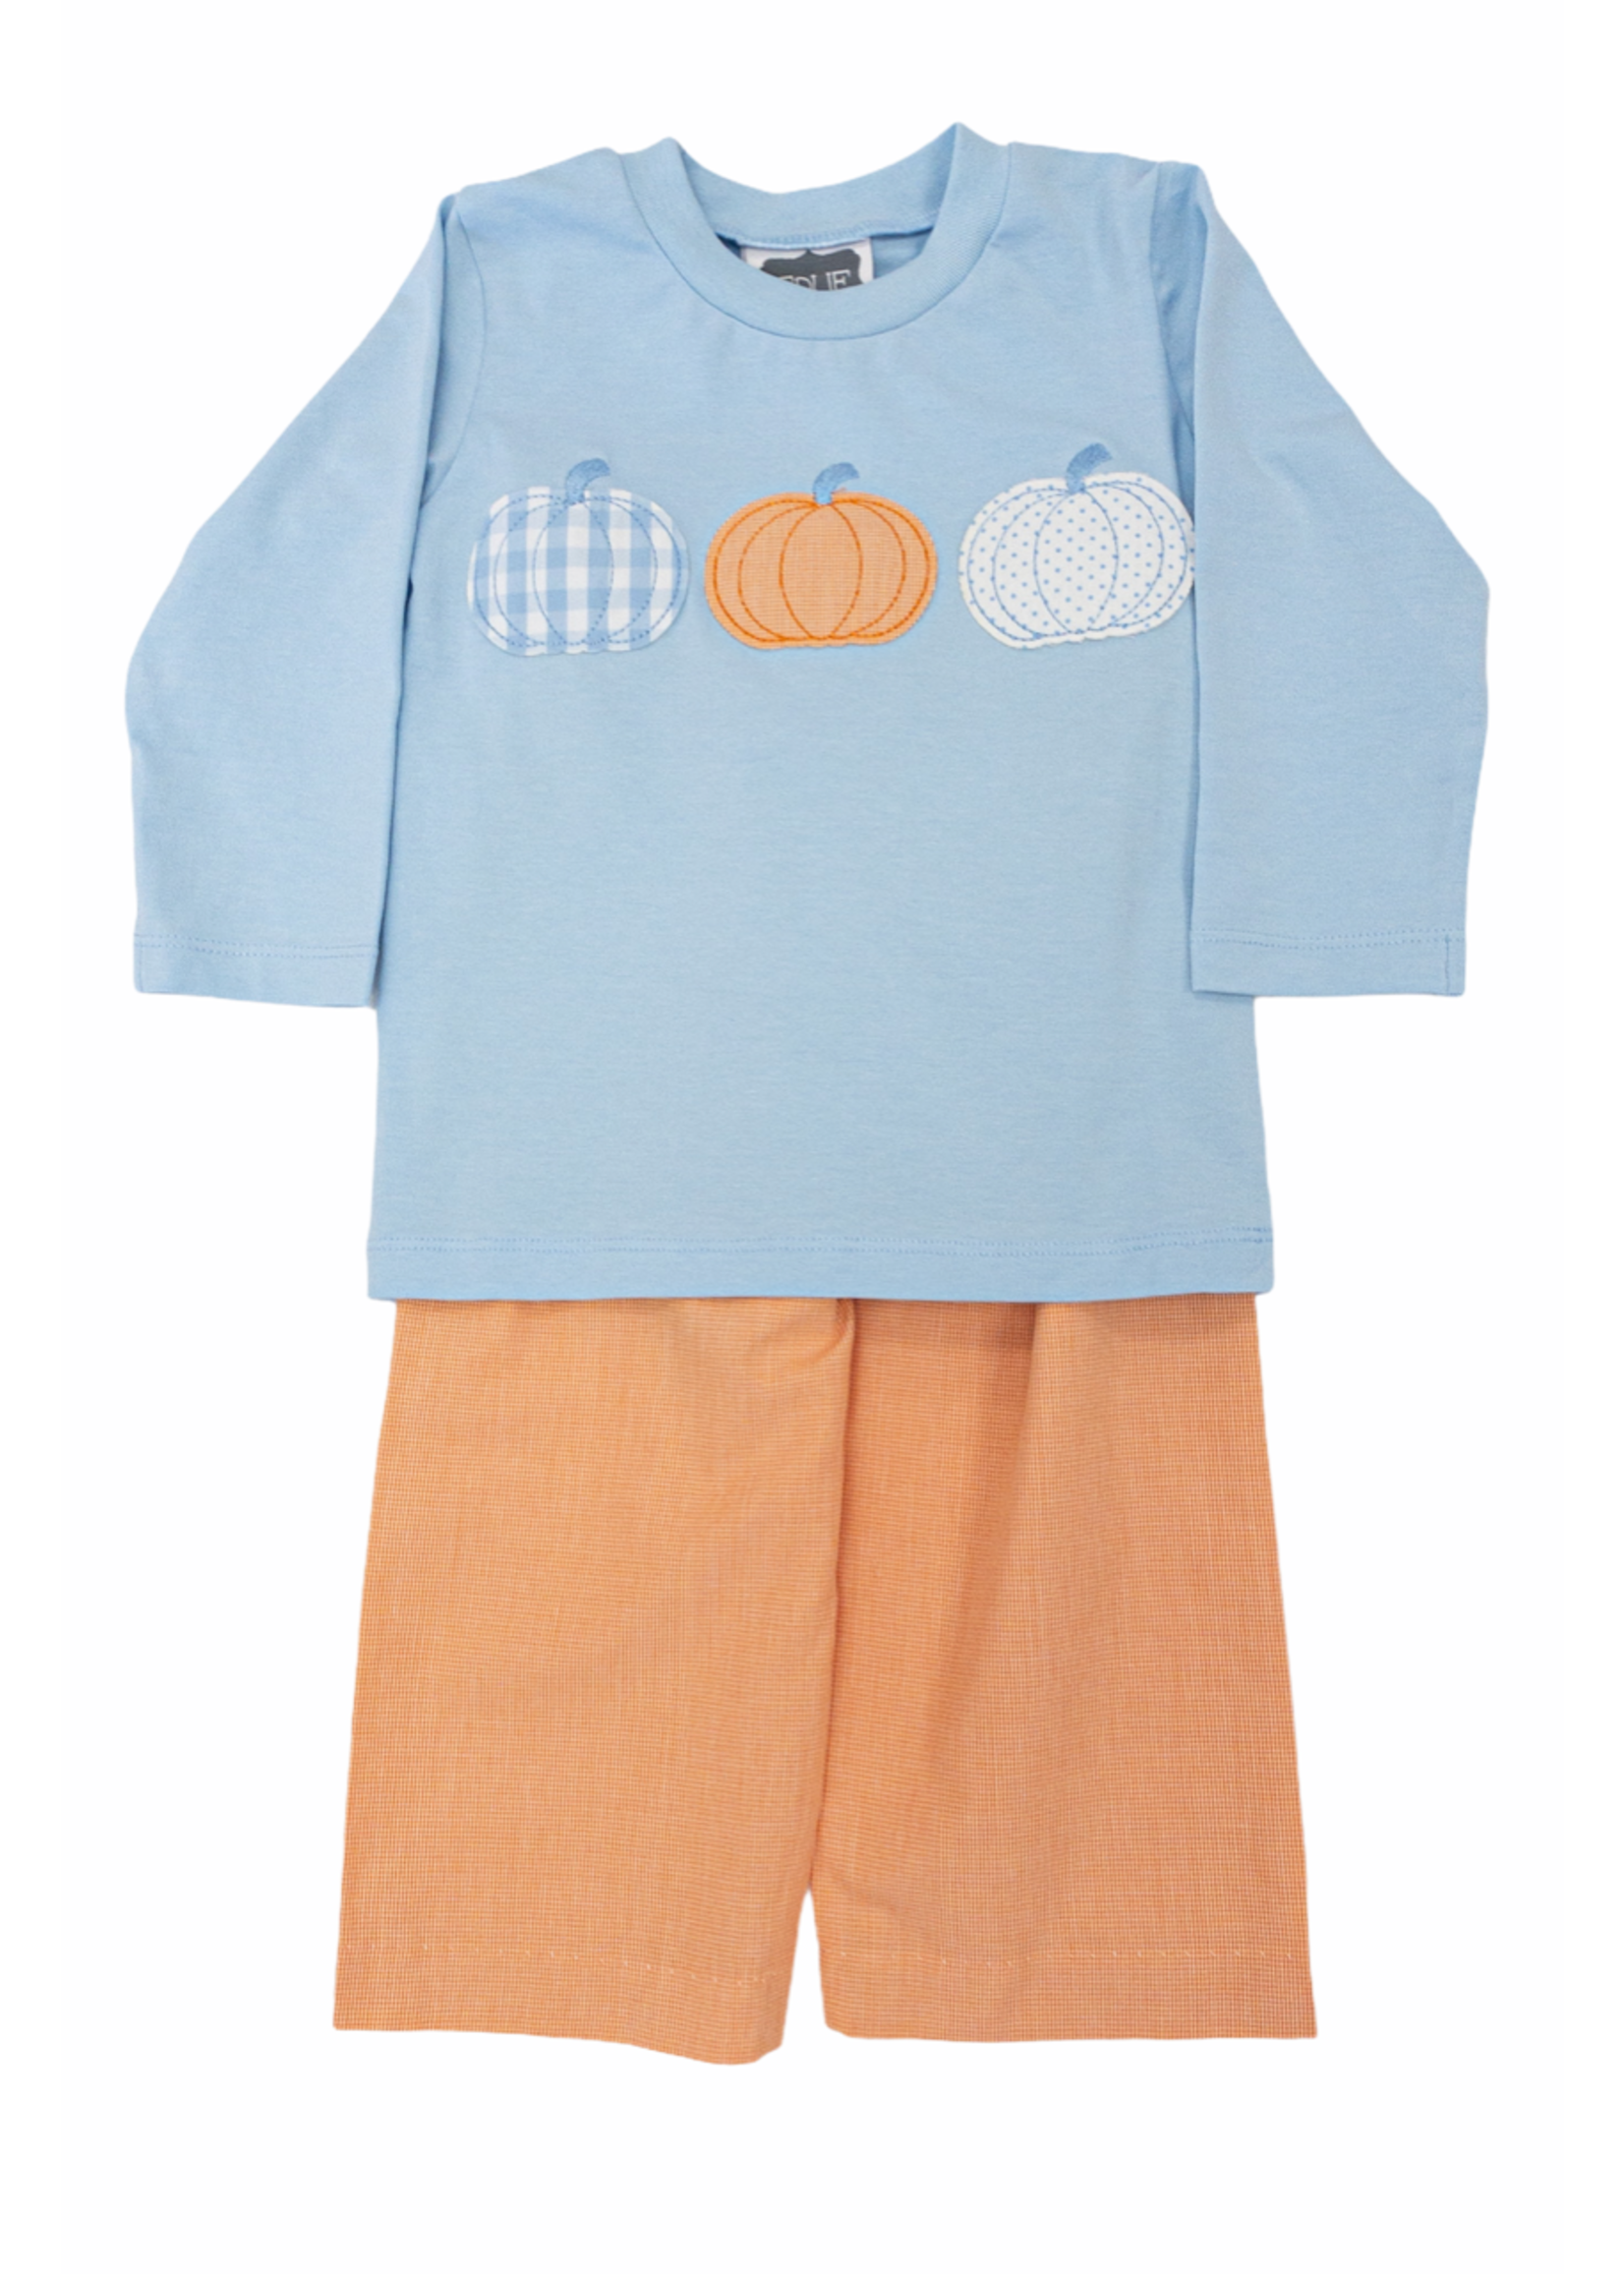 True Pumpkin App Boys Set